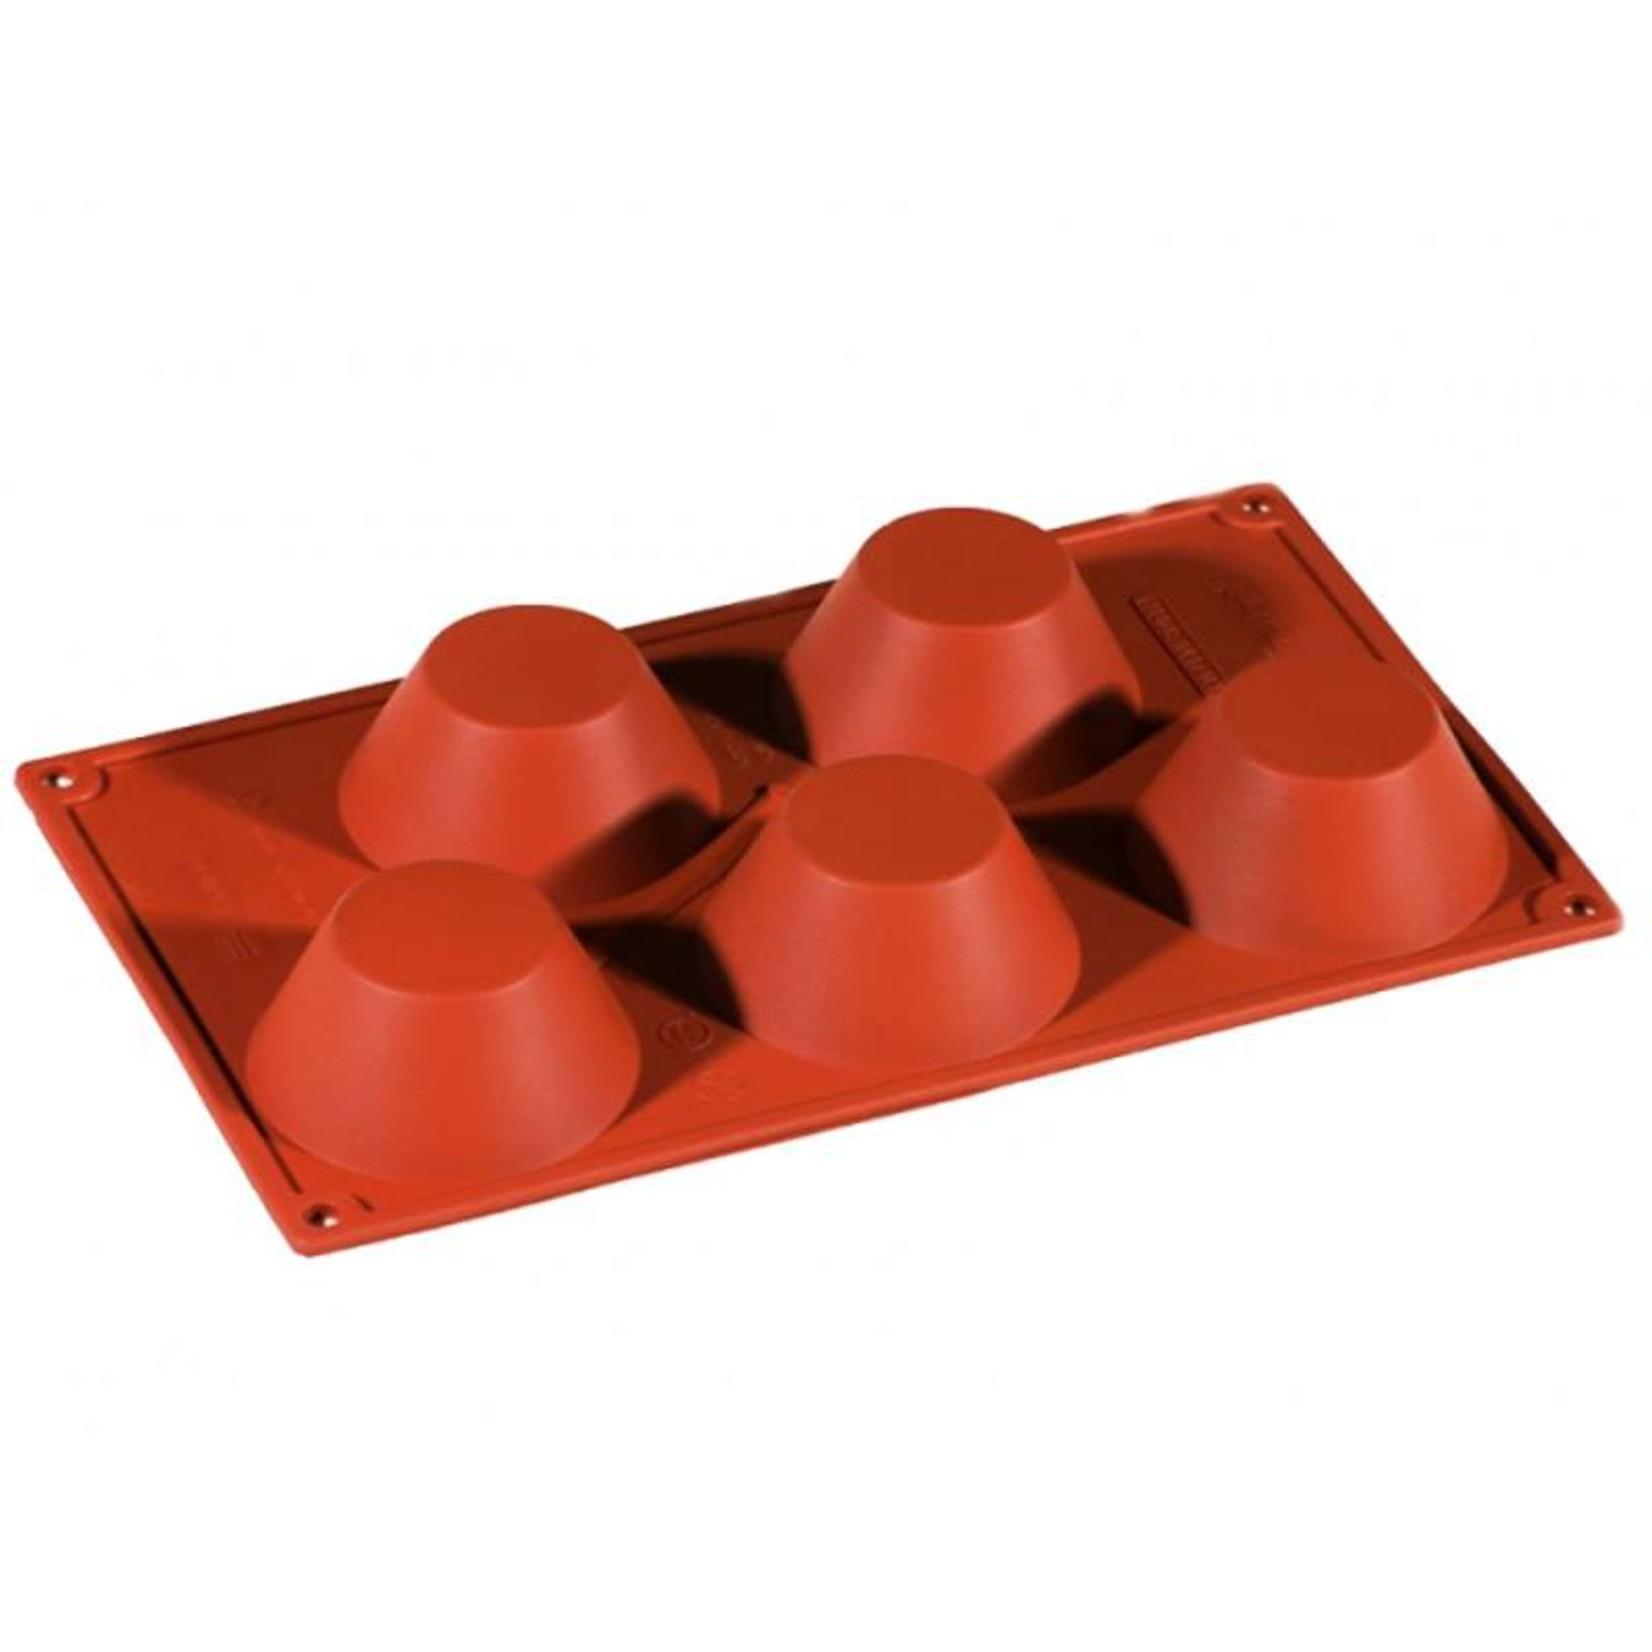 Pavoni Pavoni - Formaflex silicone mold, Muffin (5 cavity), FR029